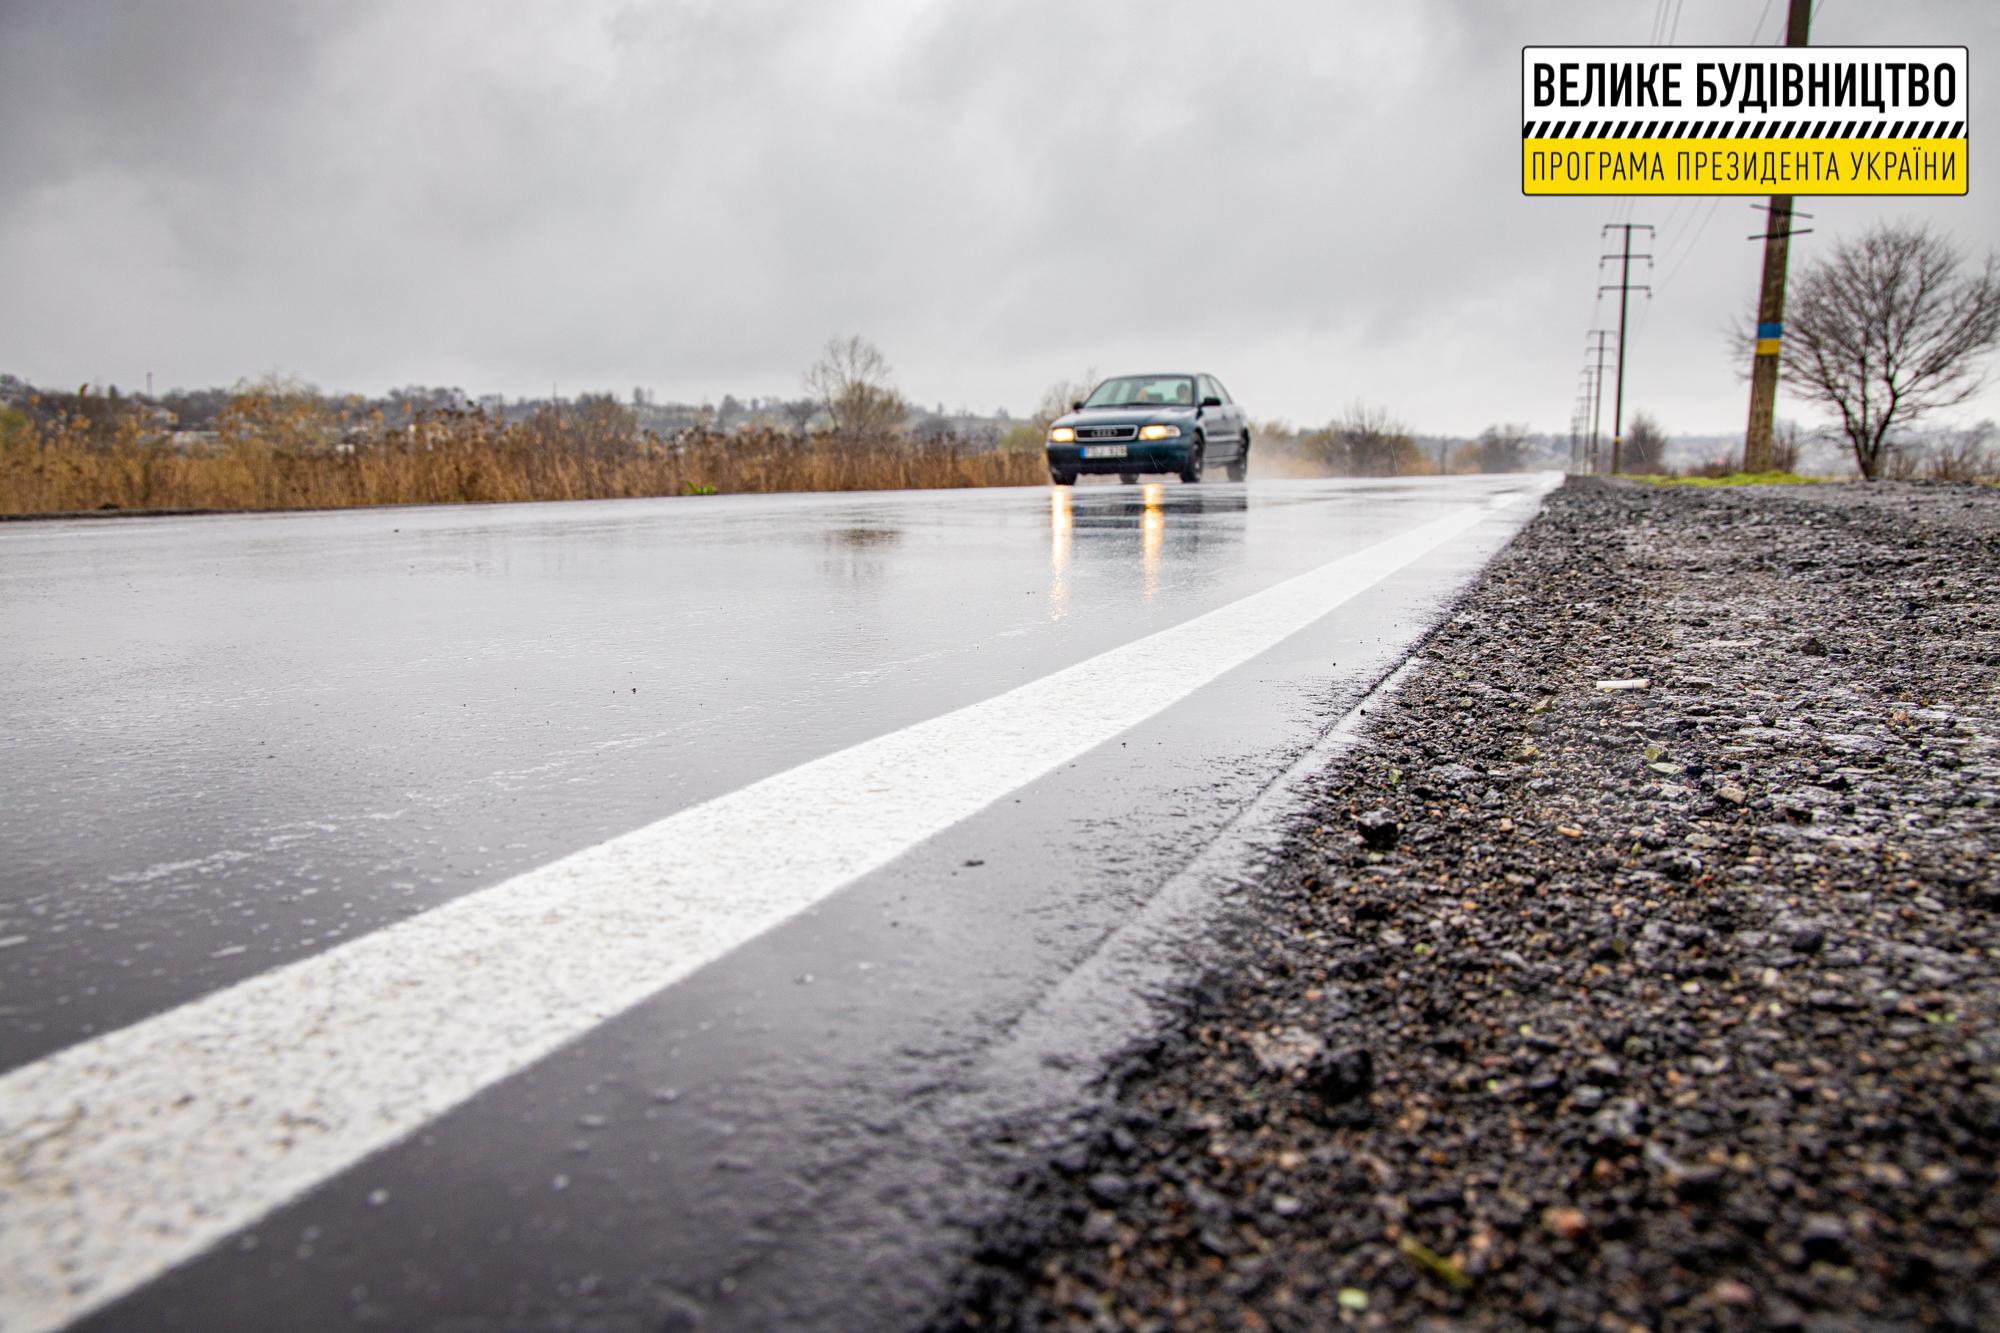 Объездная дорога. Новости Днепра